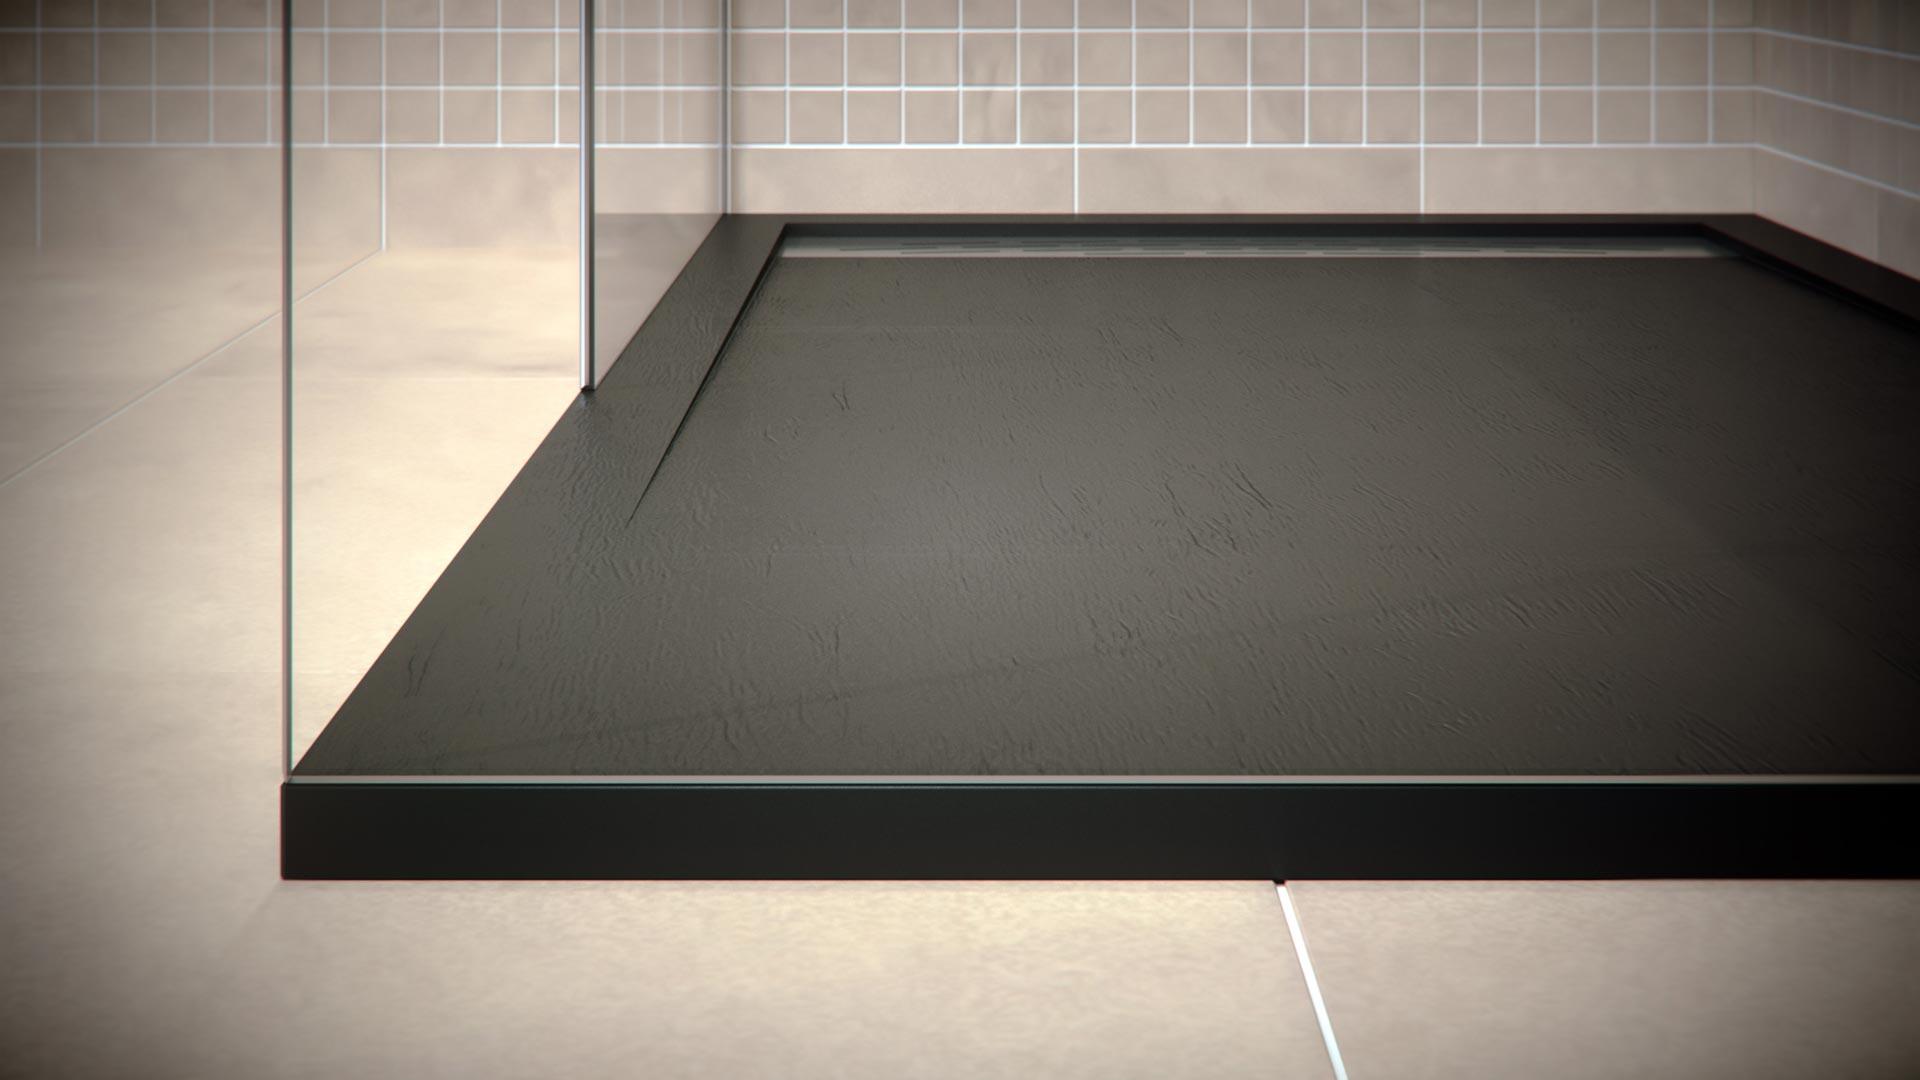 aquarell fabricant de receveurs en r sine sur mesure. Black Bedroom Furniture Sets. Home Design Ideas